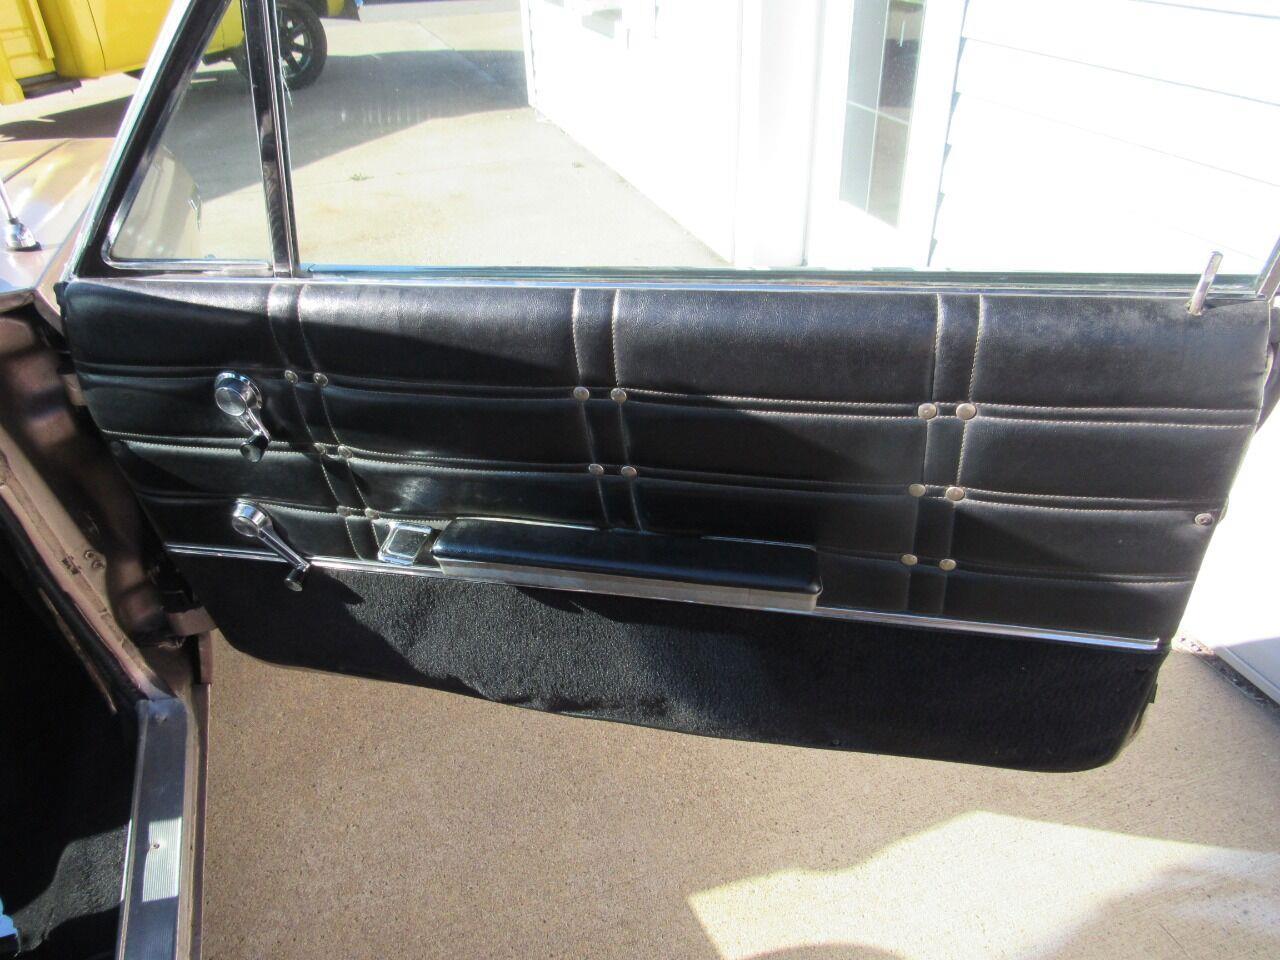 1963 Chevrolet Impala (CC-1385352) for sale in Ashland, Ohio